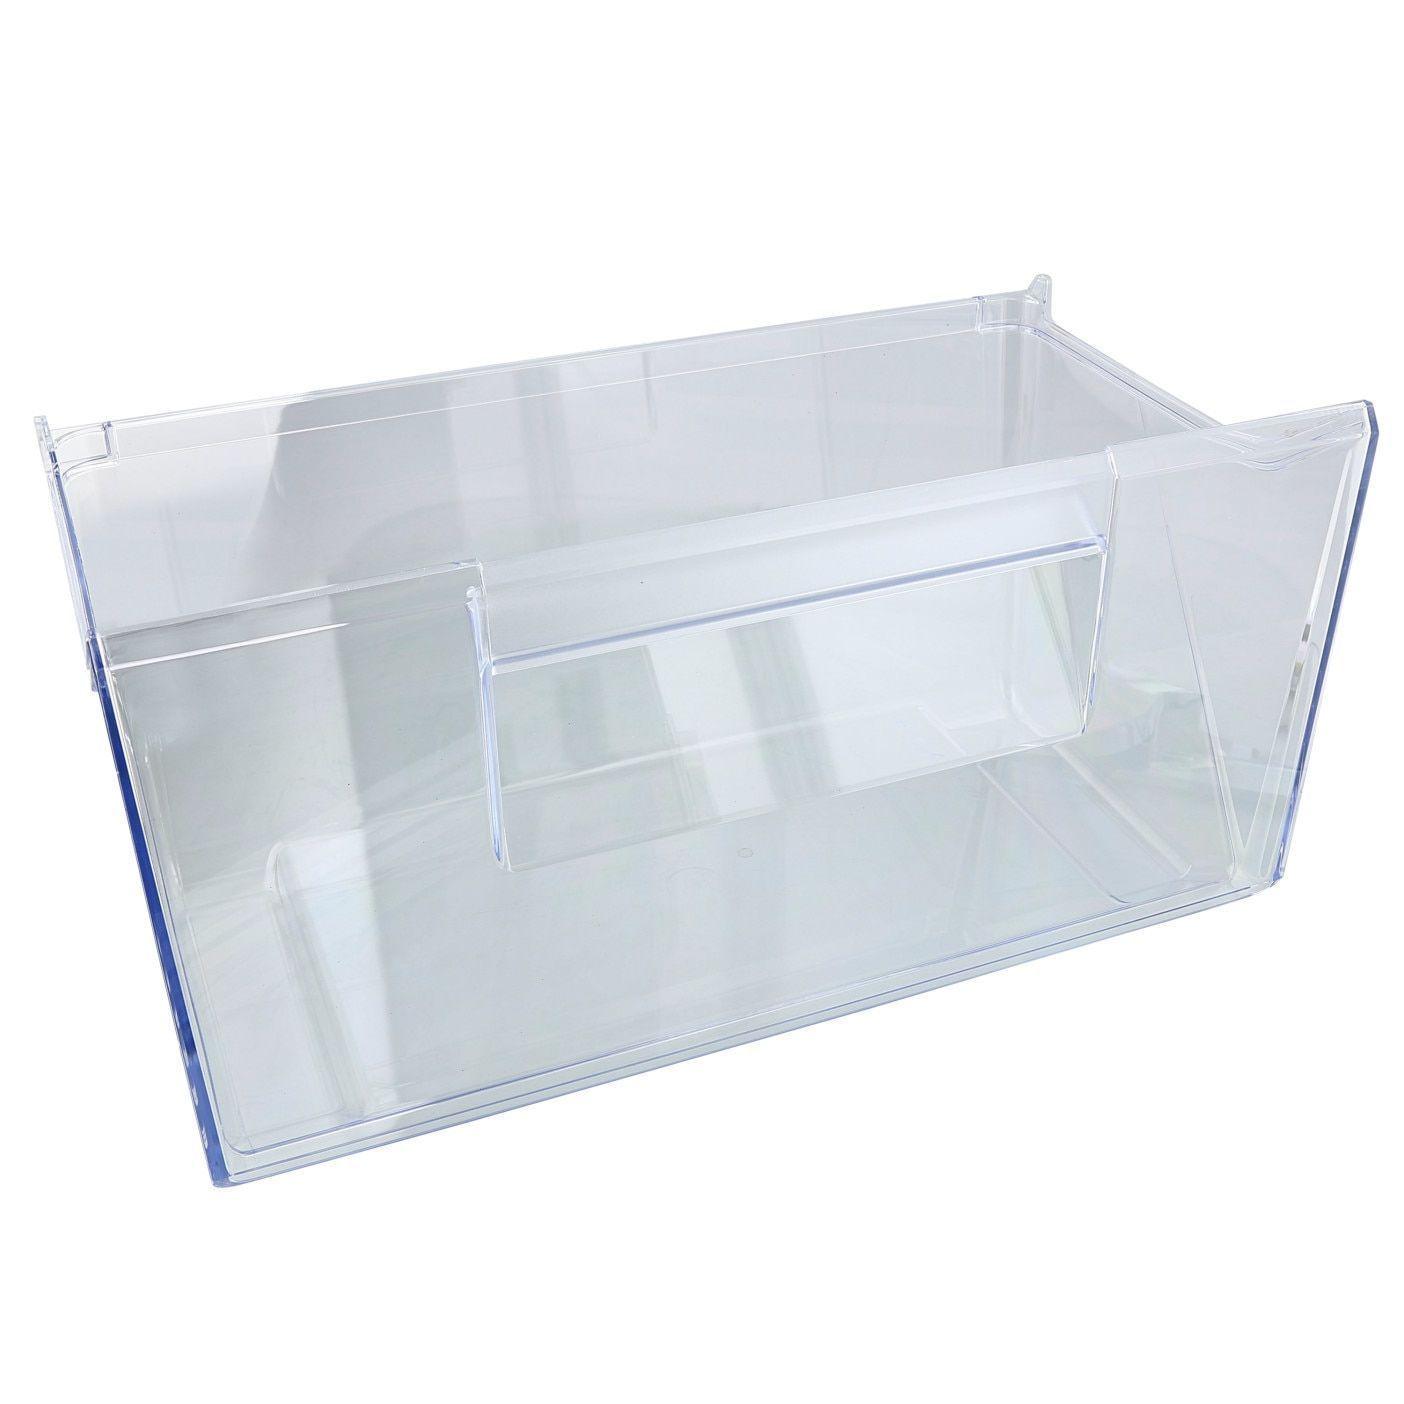 Drawer for AEG Electrolux Freezers - 2647016134 AEG / Electrolux / Zanussi